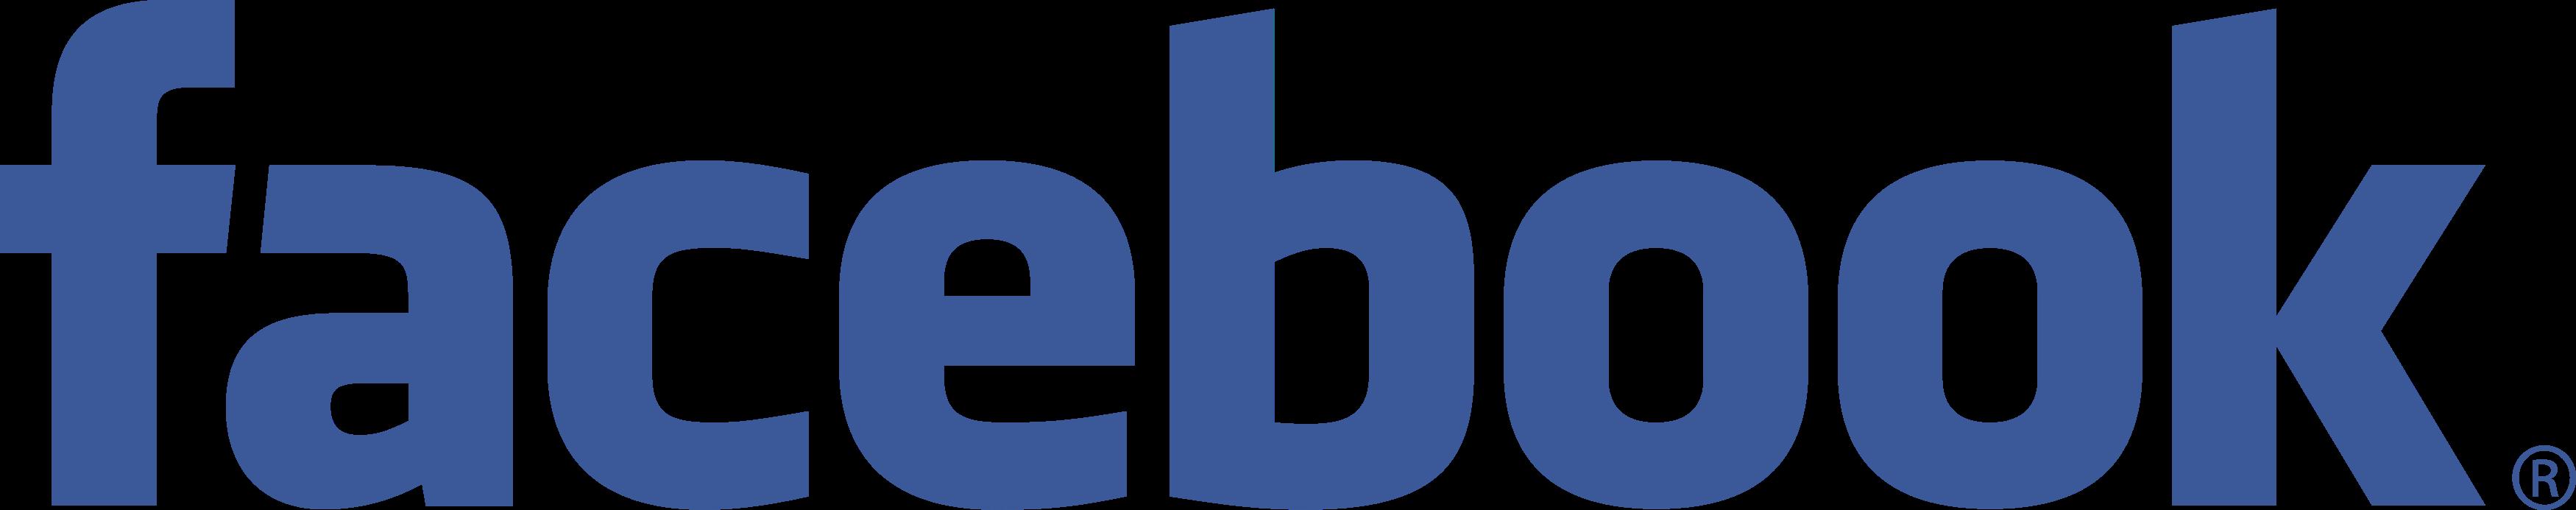 Social Media Facebook Business Manager logo